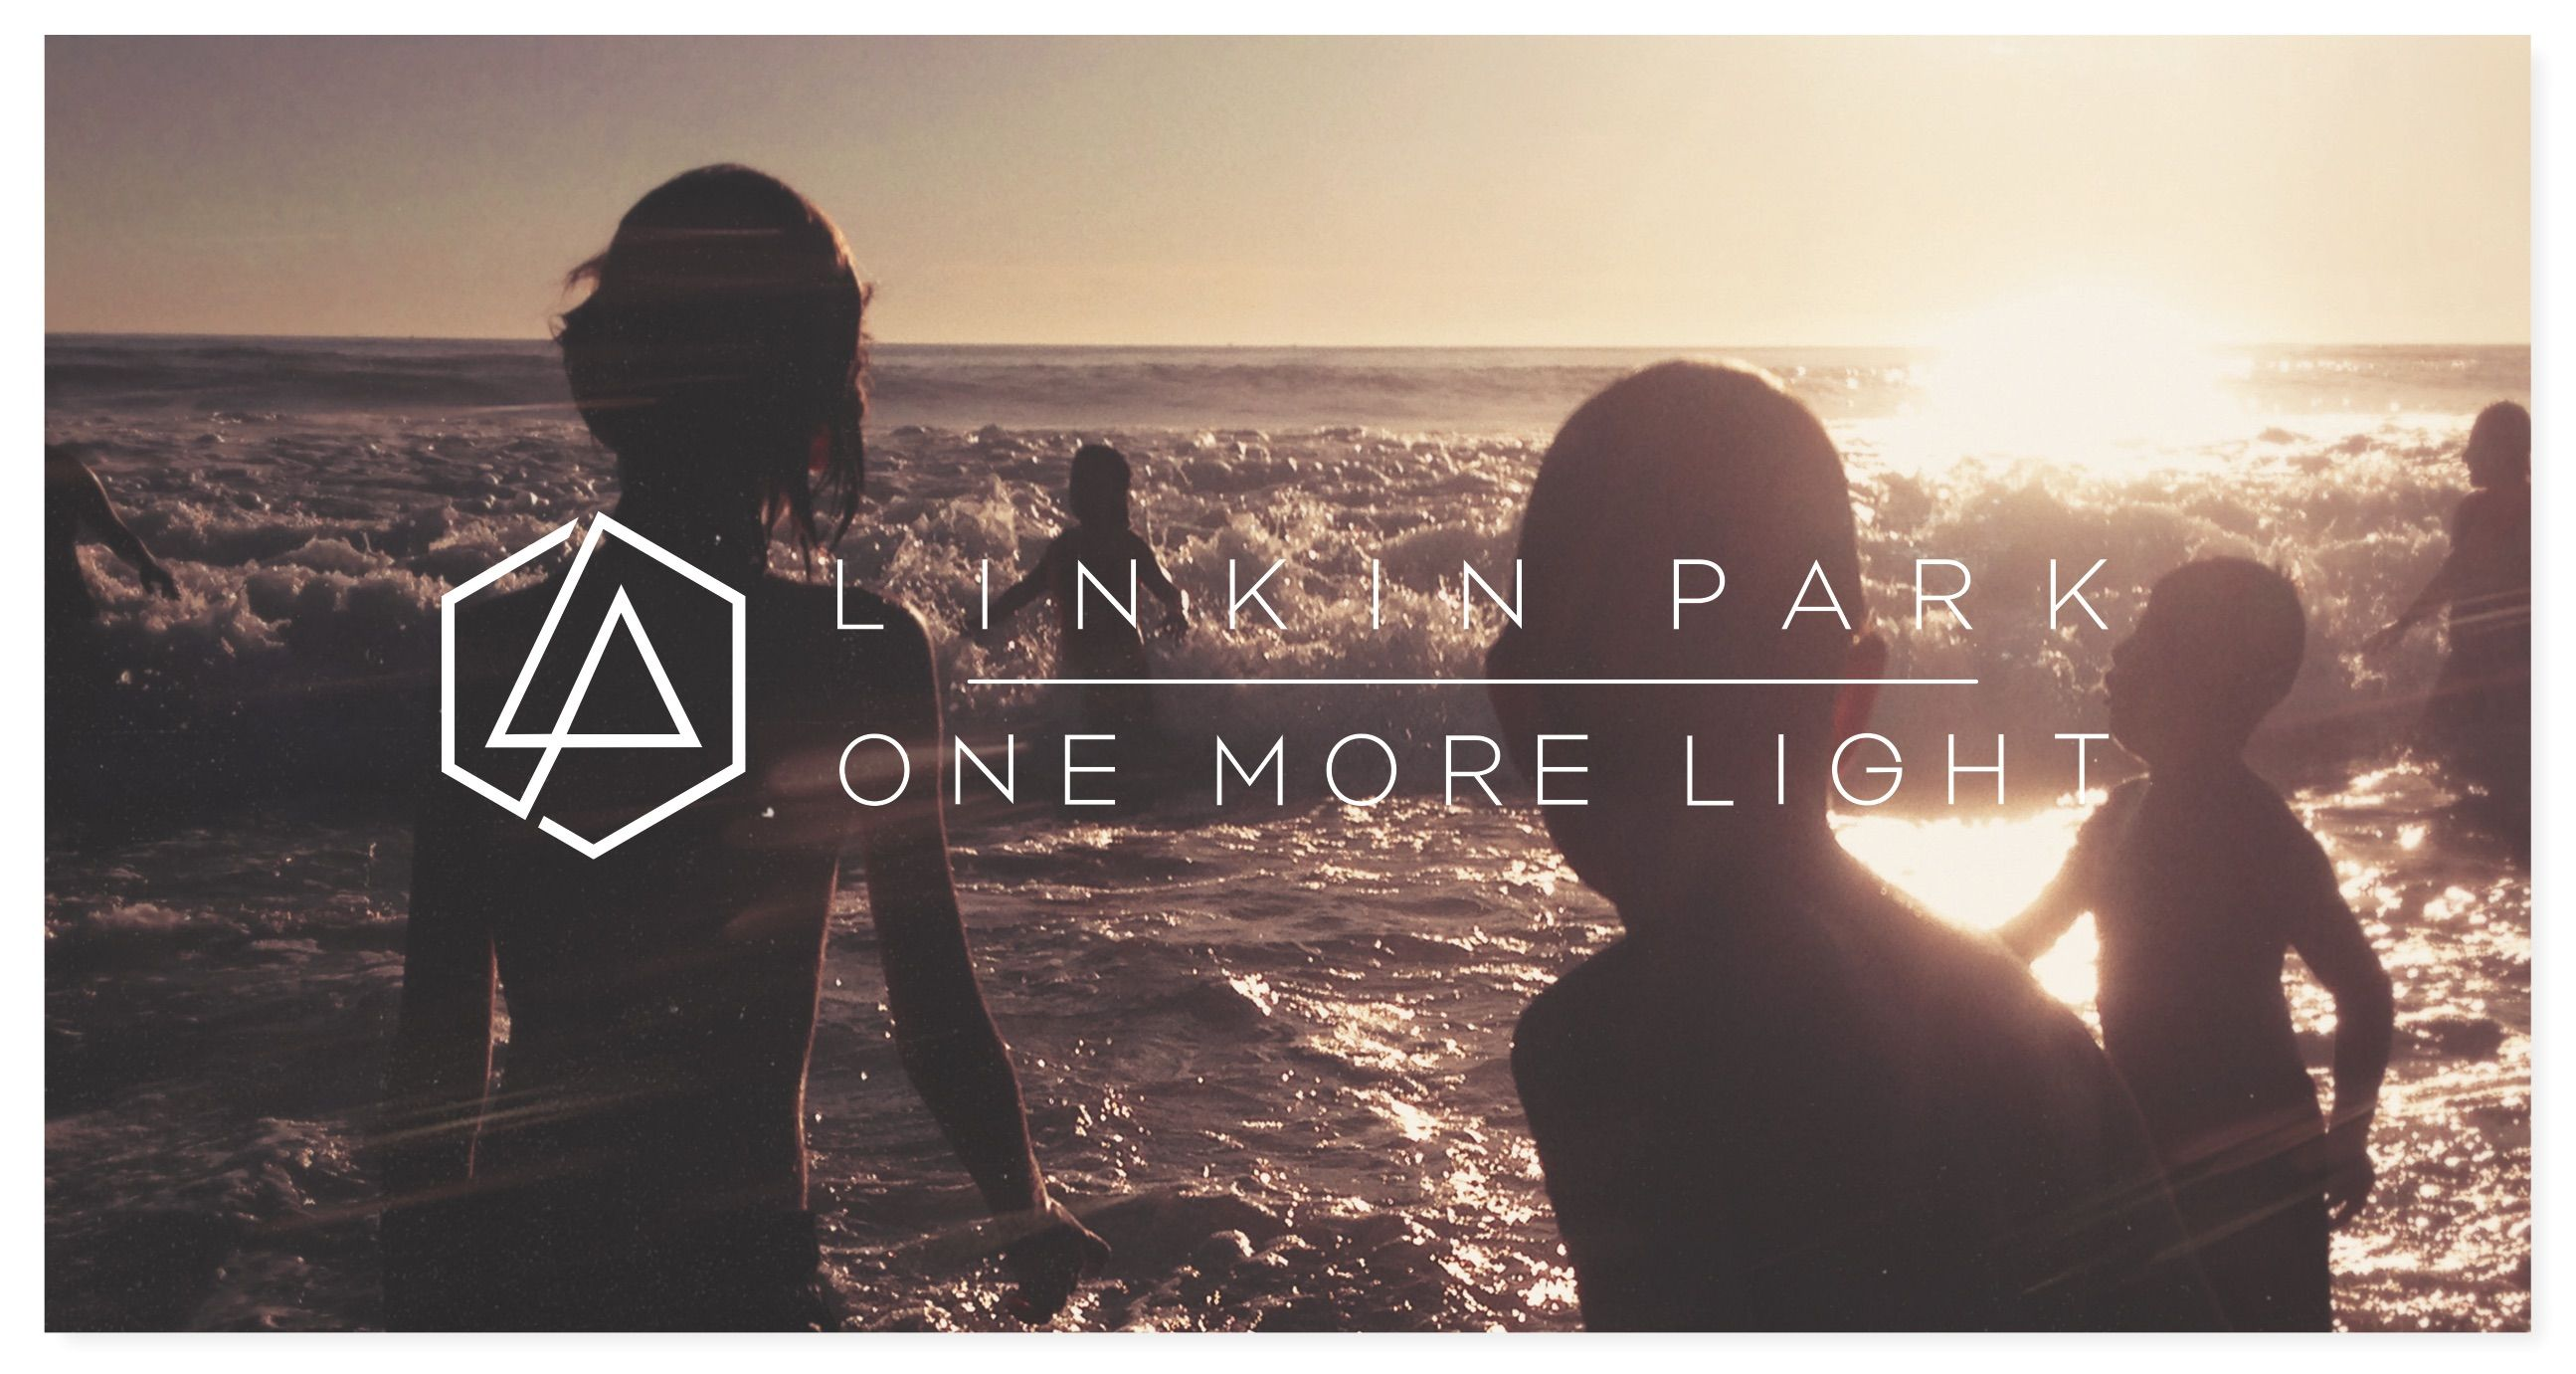 Linkin Park S New Album One More Light Available Now Em